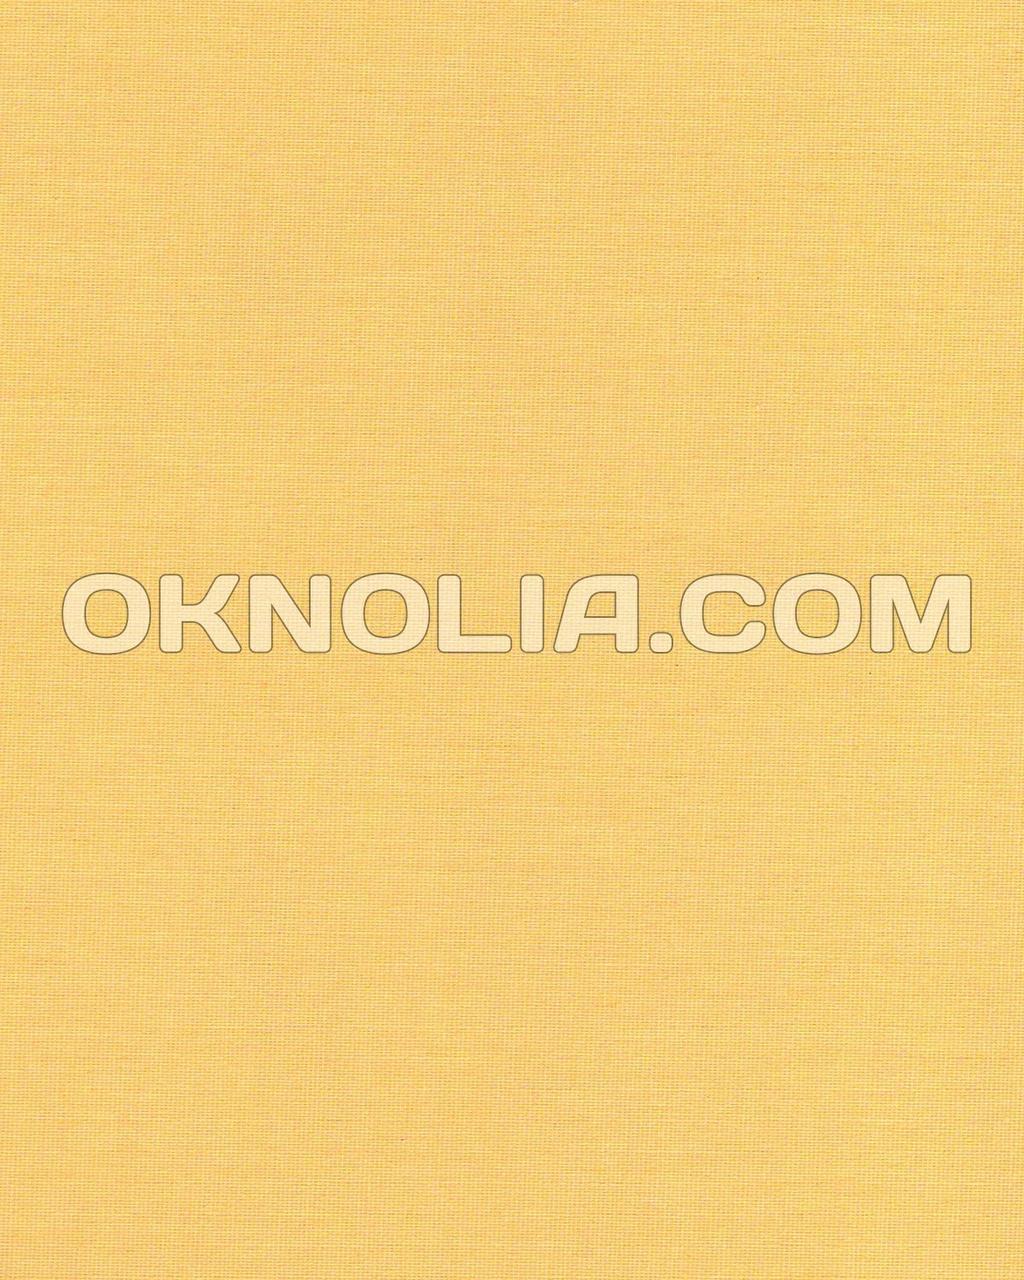 Рулонные жалюзи Ара 1003 желтый, 50*170 см